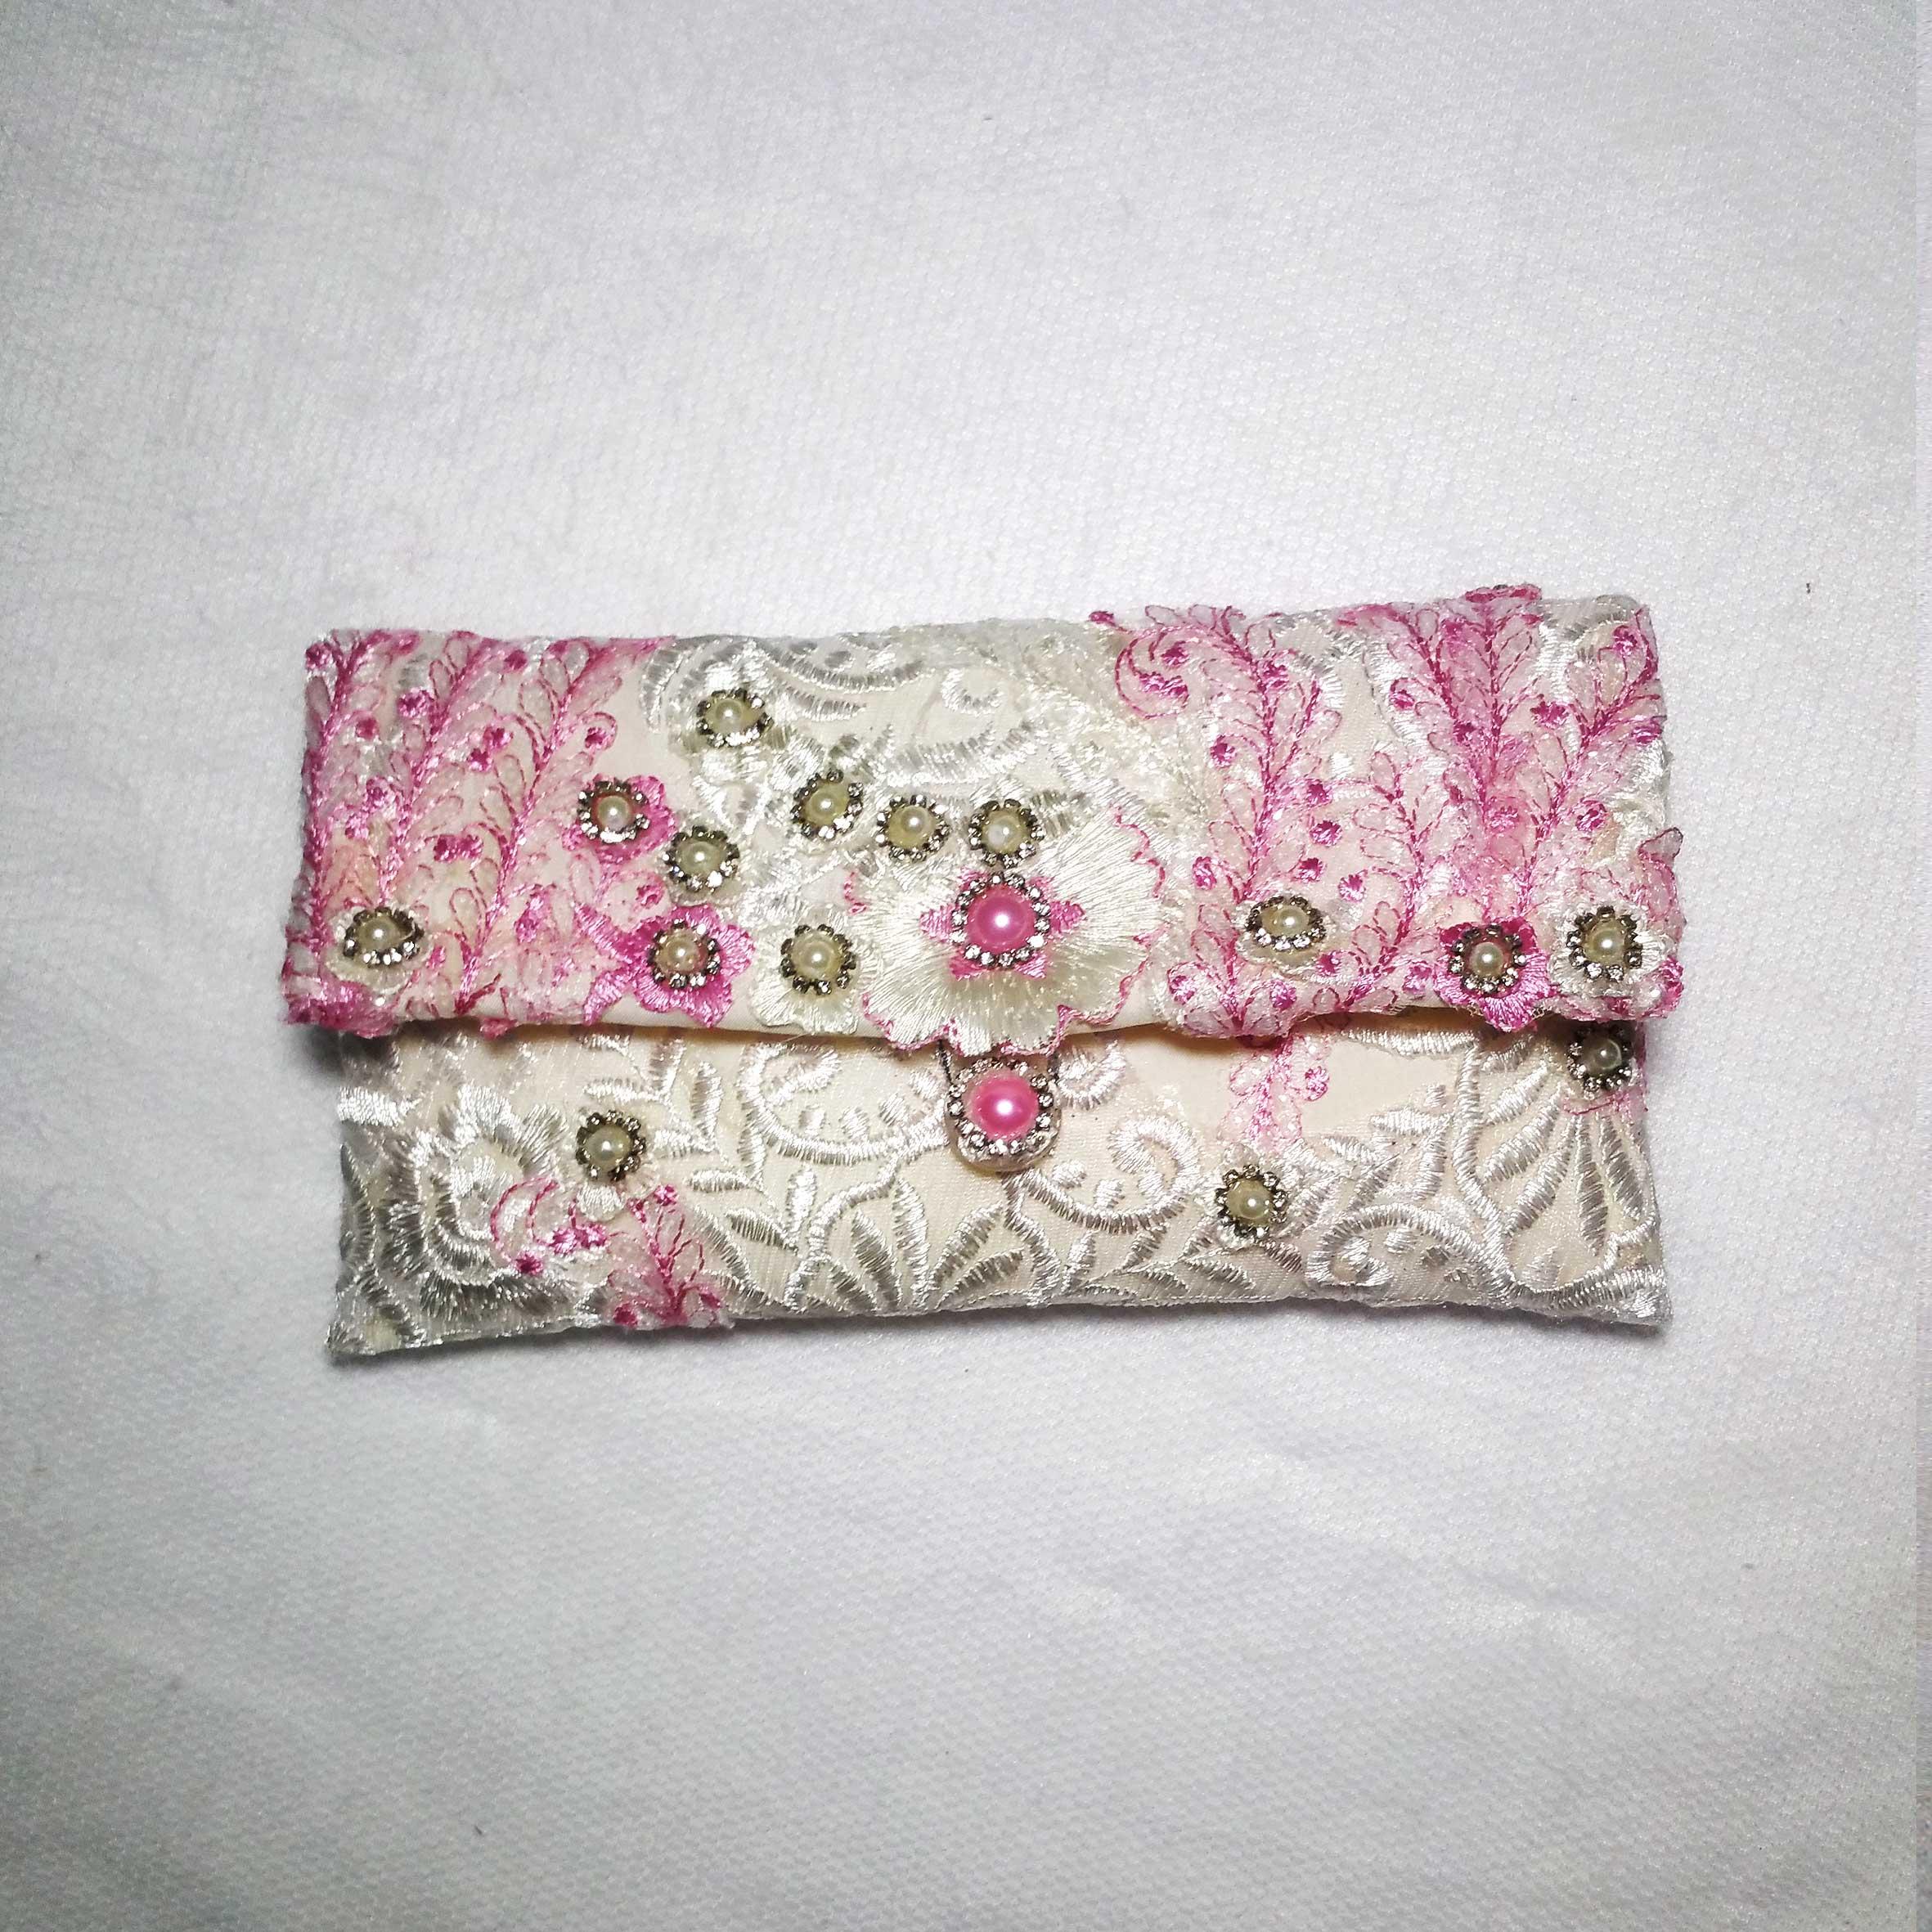 Pink Brocade With Pearl Clutch Handbag